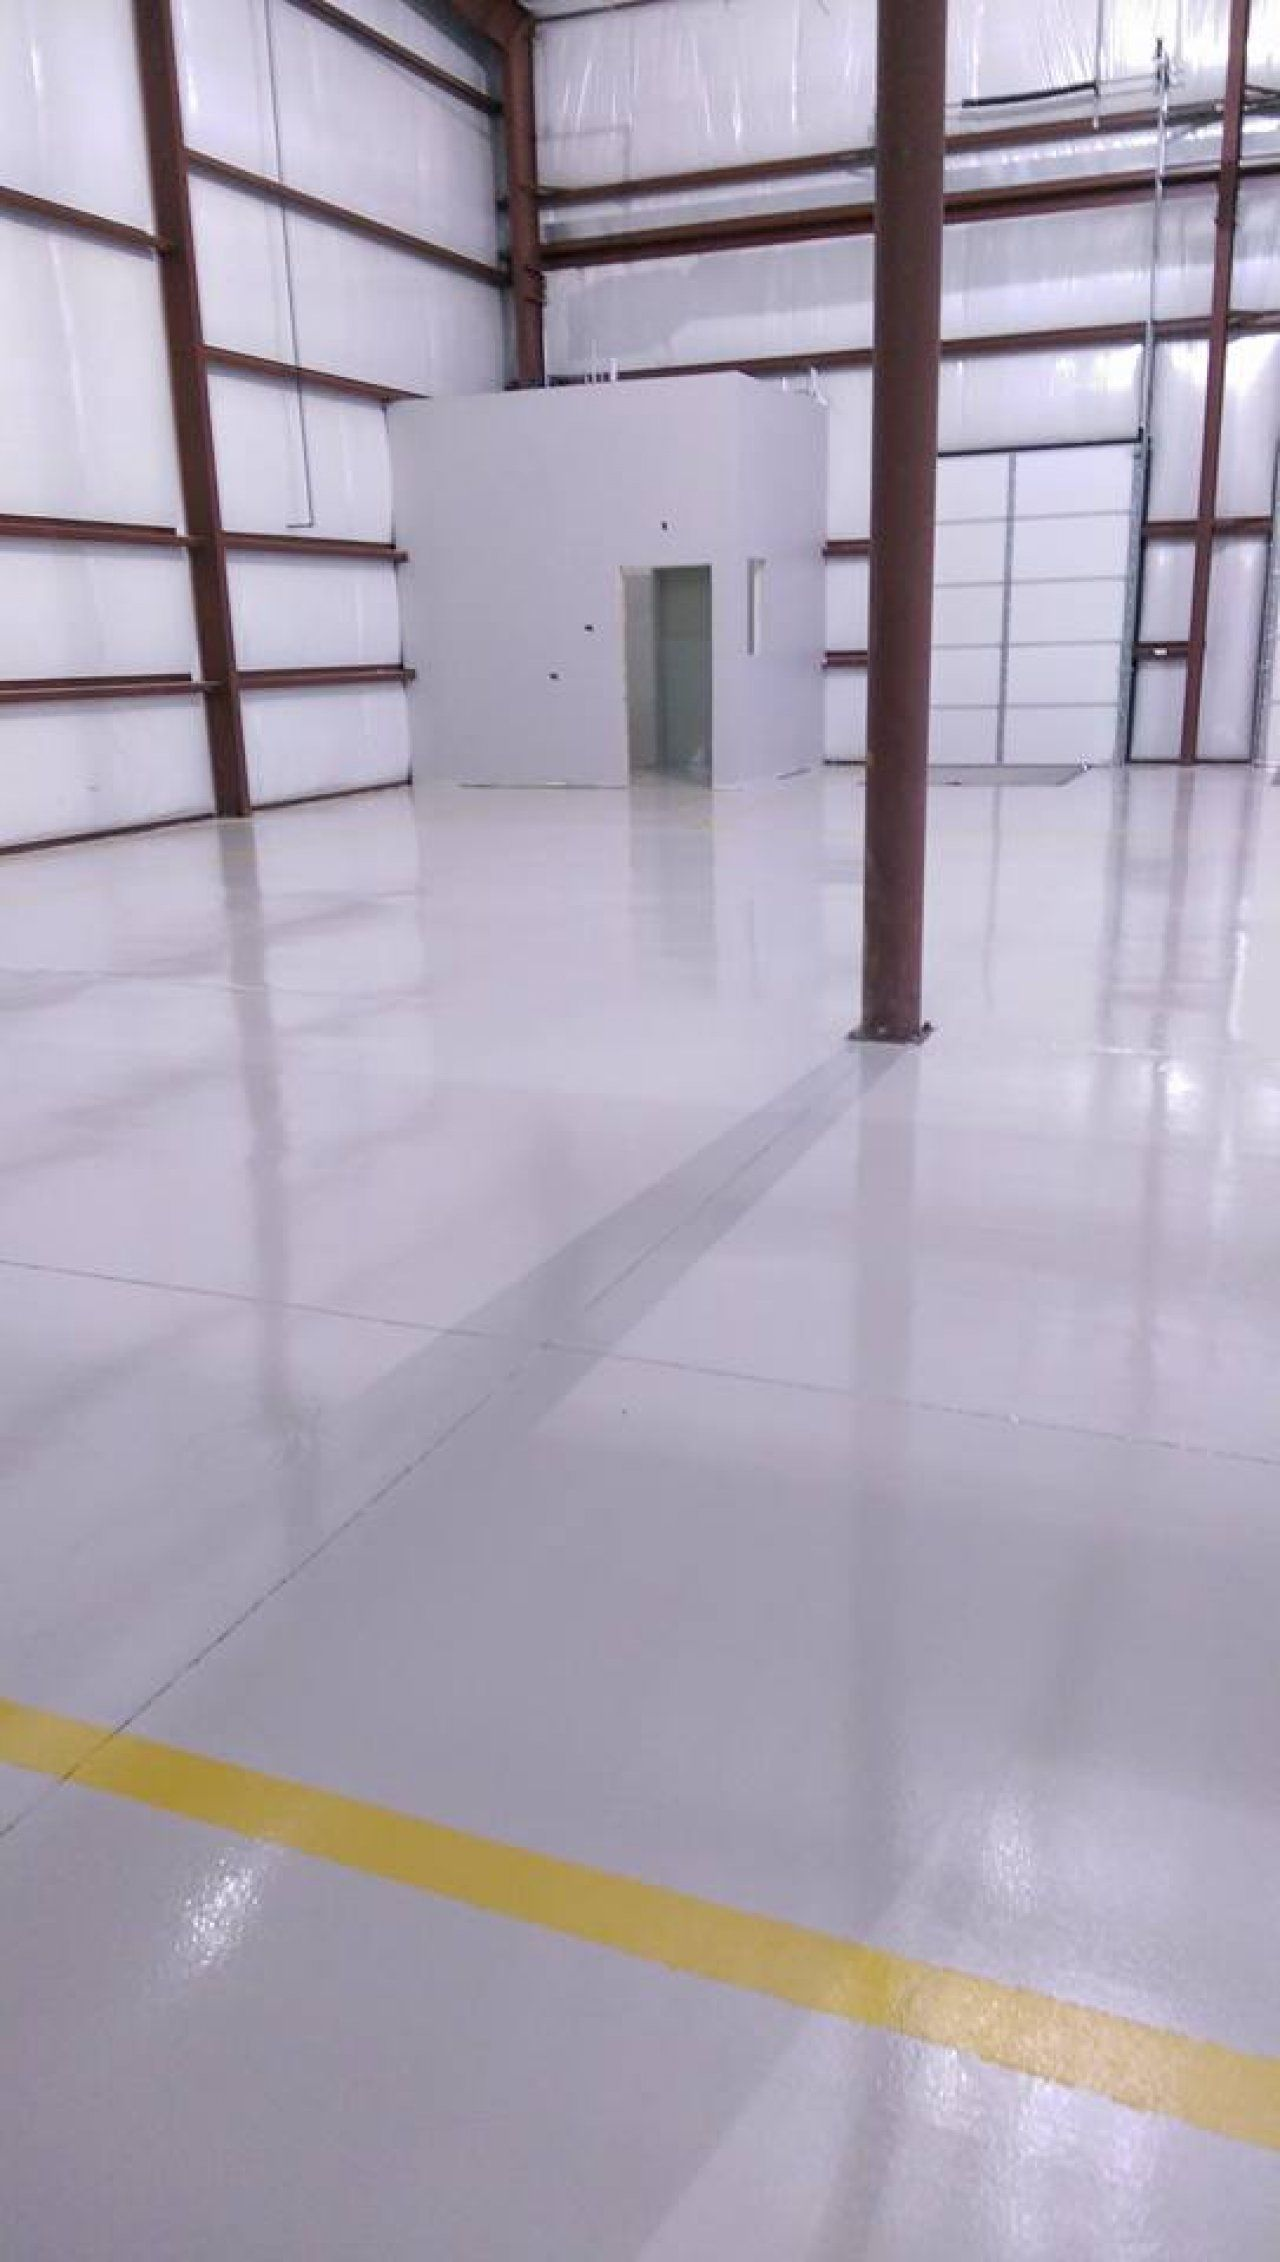 123 Resinous Epoxy Floor In Factory Des Moines Iowa